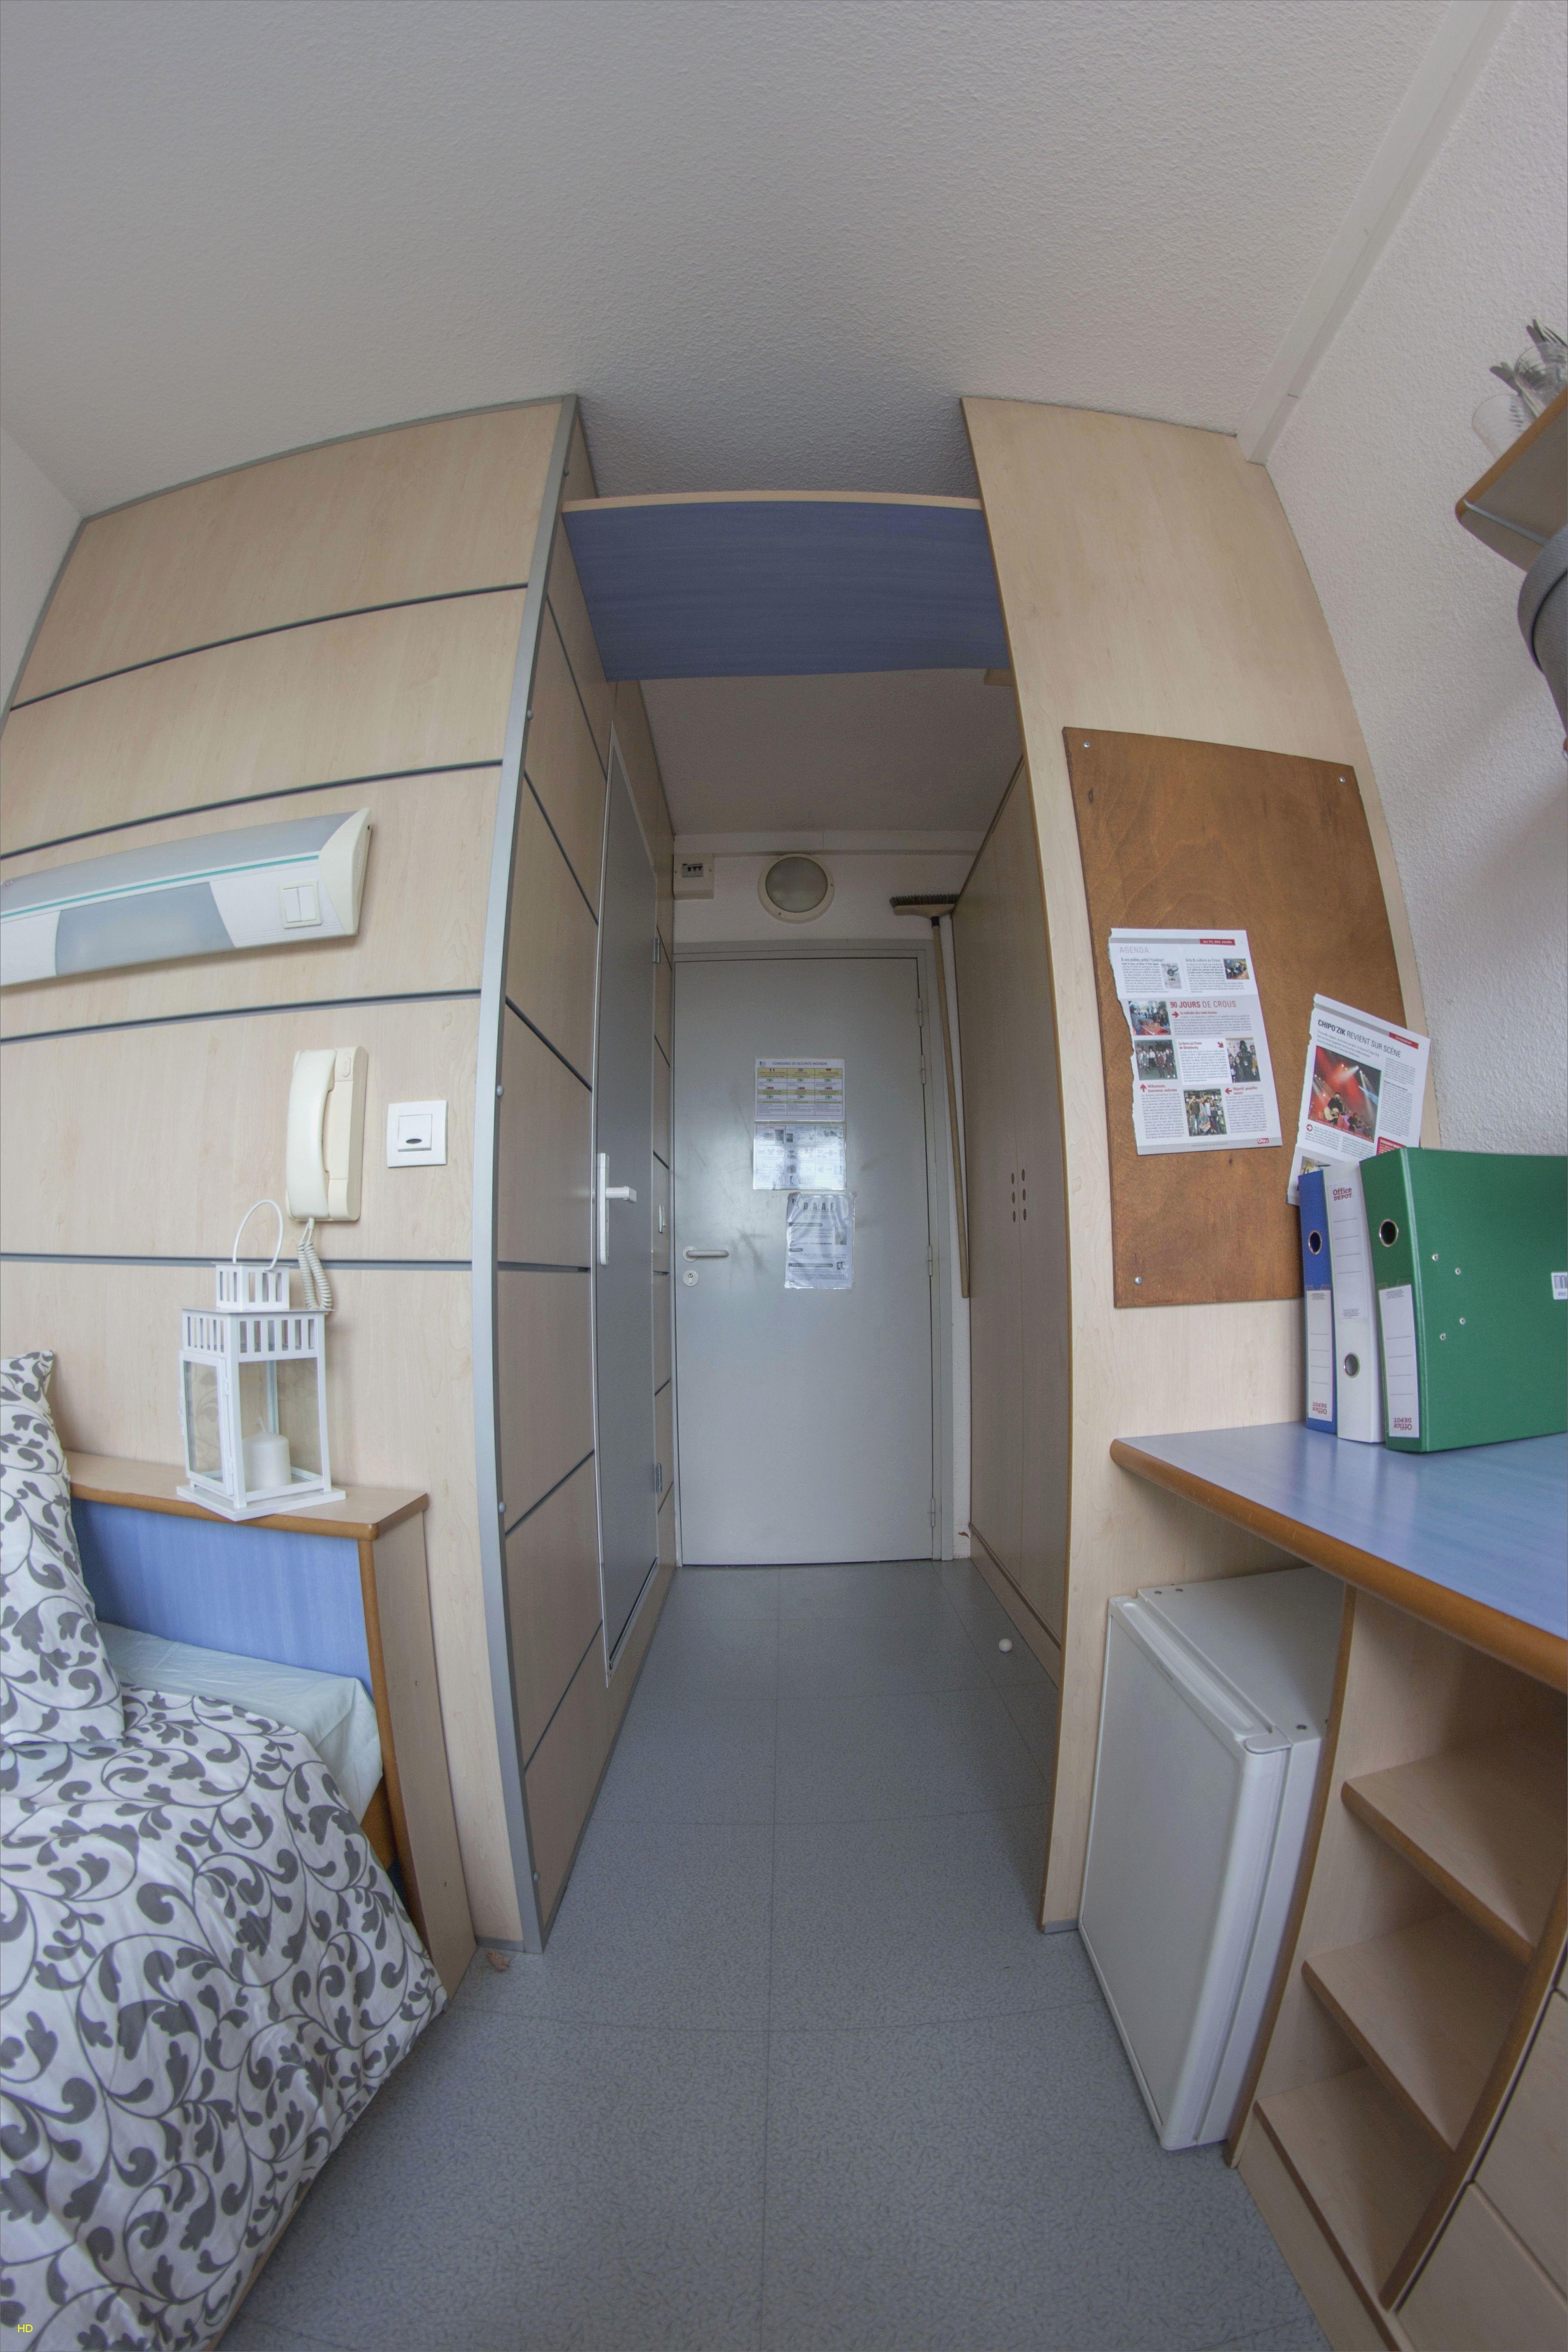 Pin By Lbrahimdah On Chambre Etudiant Dorm Room Organization Kitchen Design Room Organization